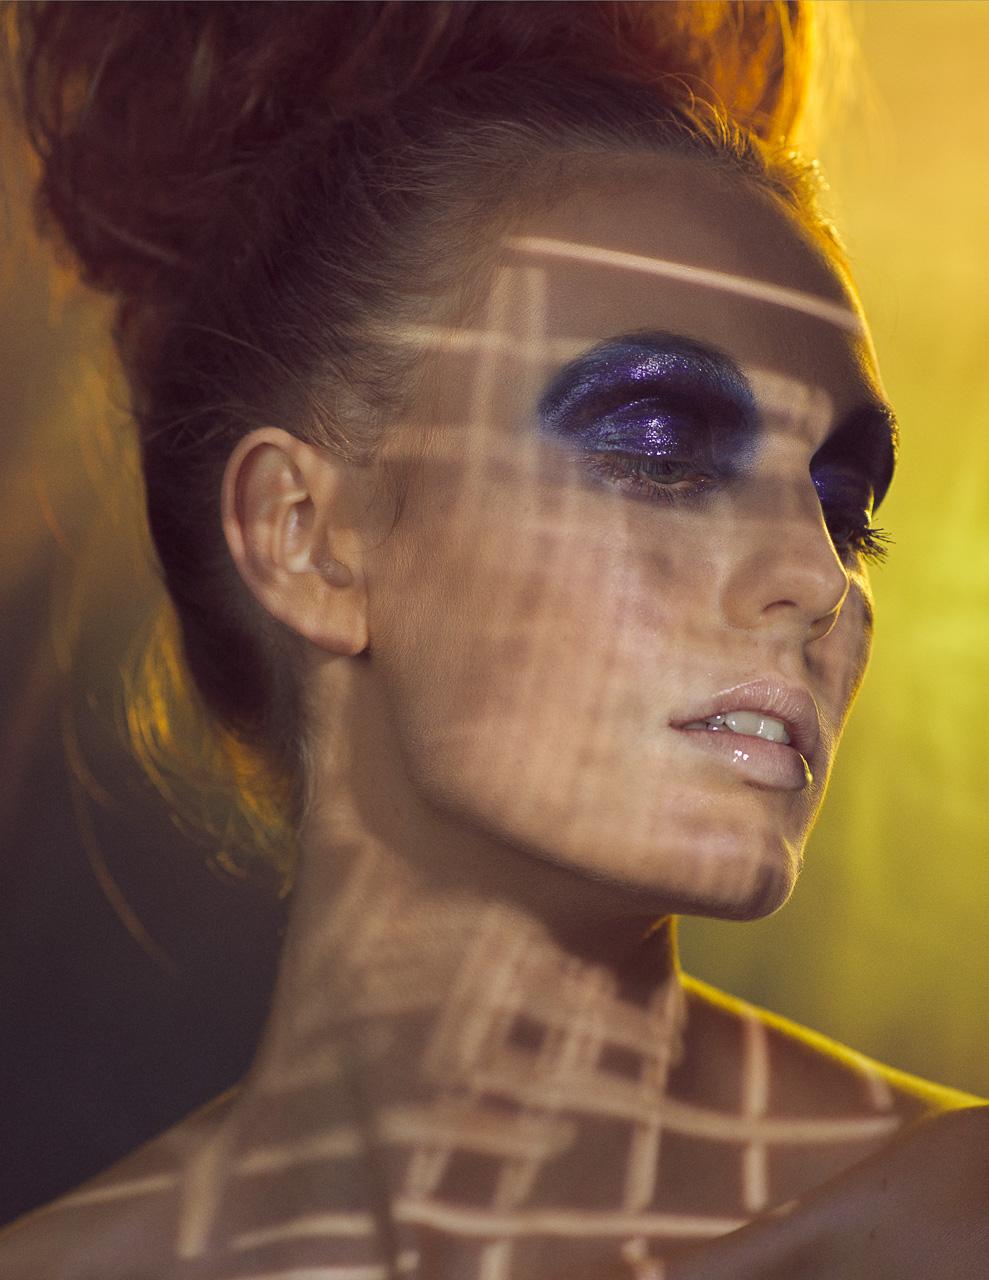 Beauty Fotoshooting München Portrait